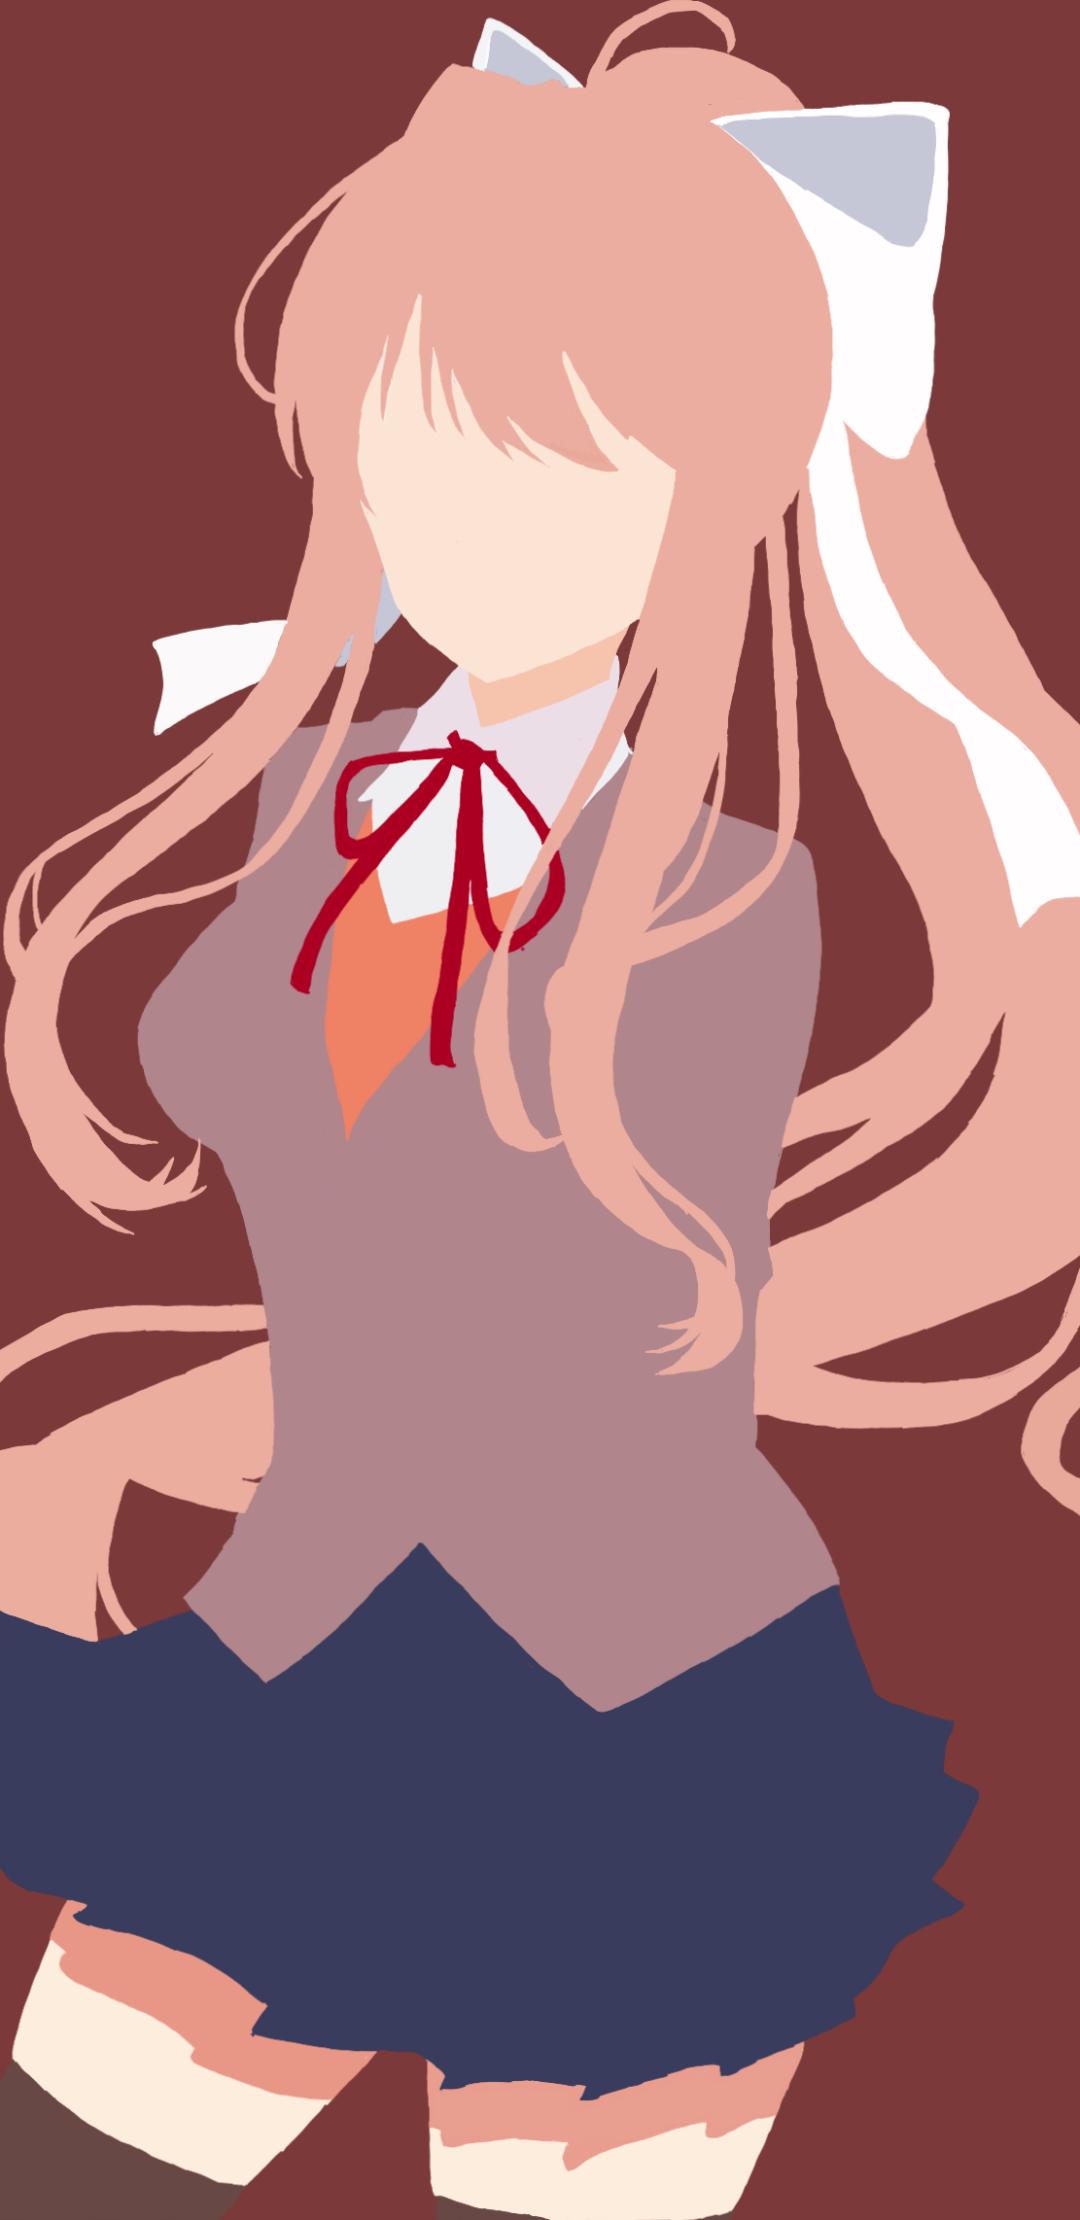 Wallpaper Engine Monika